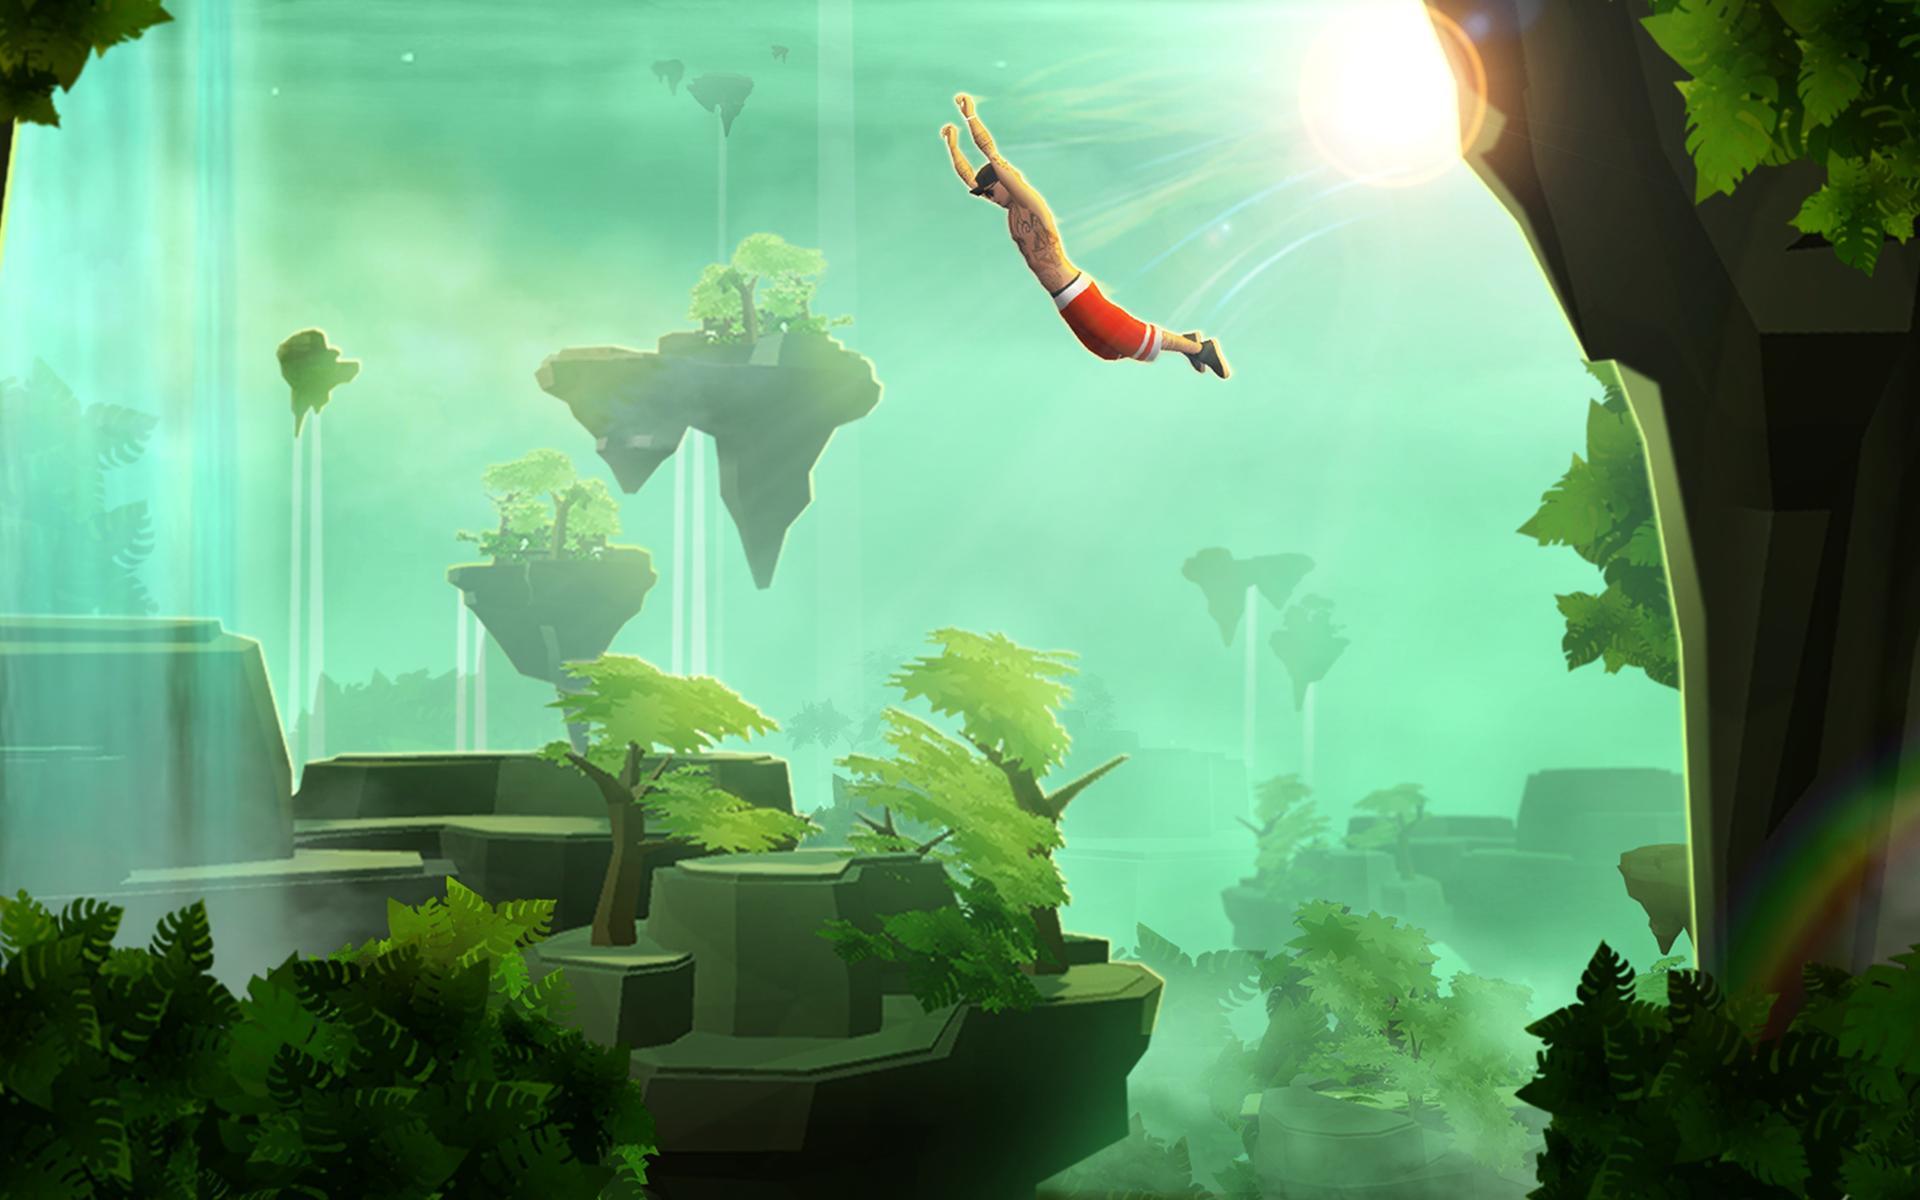 Sky Dancer Run - Running Game 4.2.0 Screenshot 18